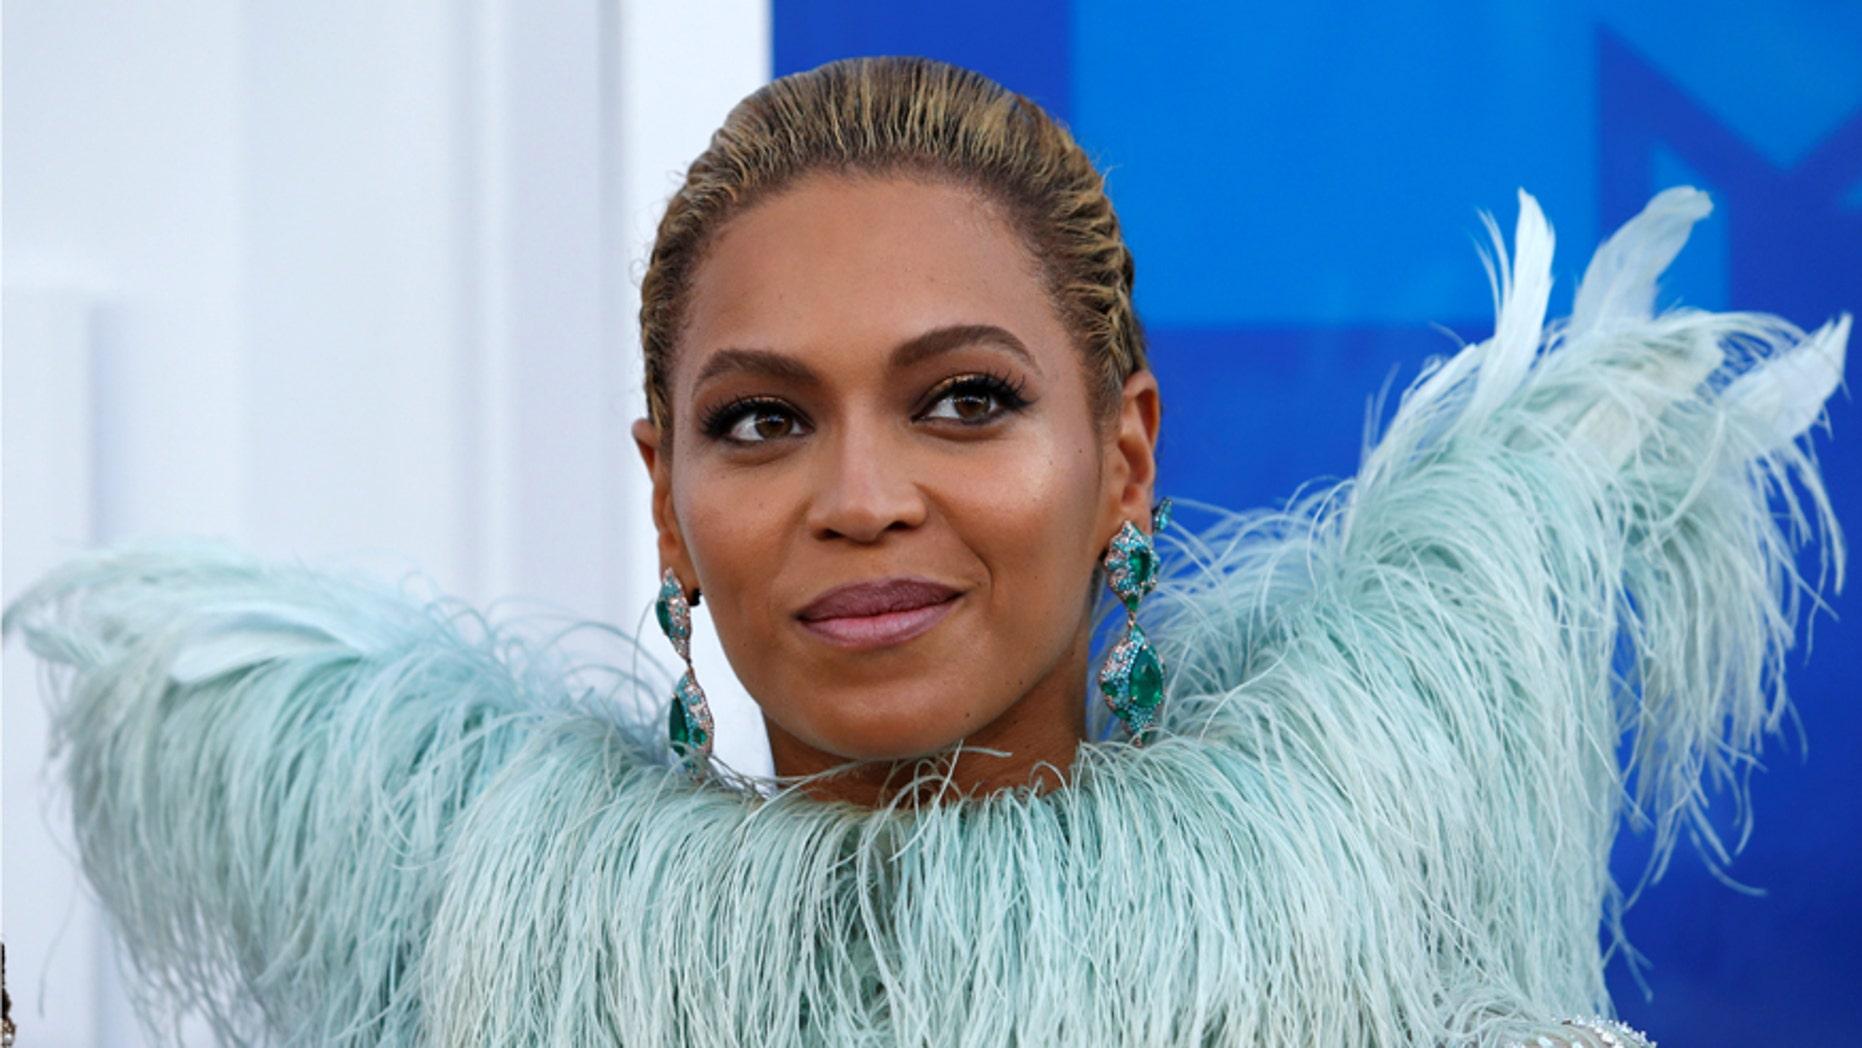 Singer Beyonce arrives at the 2016 MTV Video Music Awards in New York, U.S., August 28, 2016.  REUTERS/Eduardo Munoz/File Photo - RTSPNH0